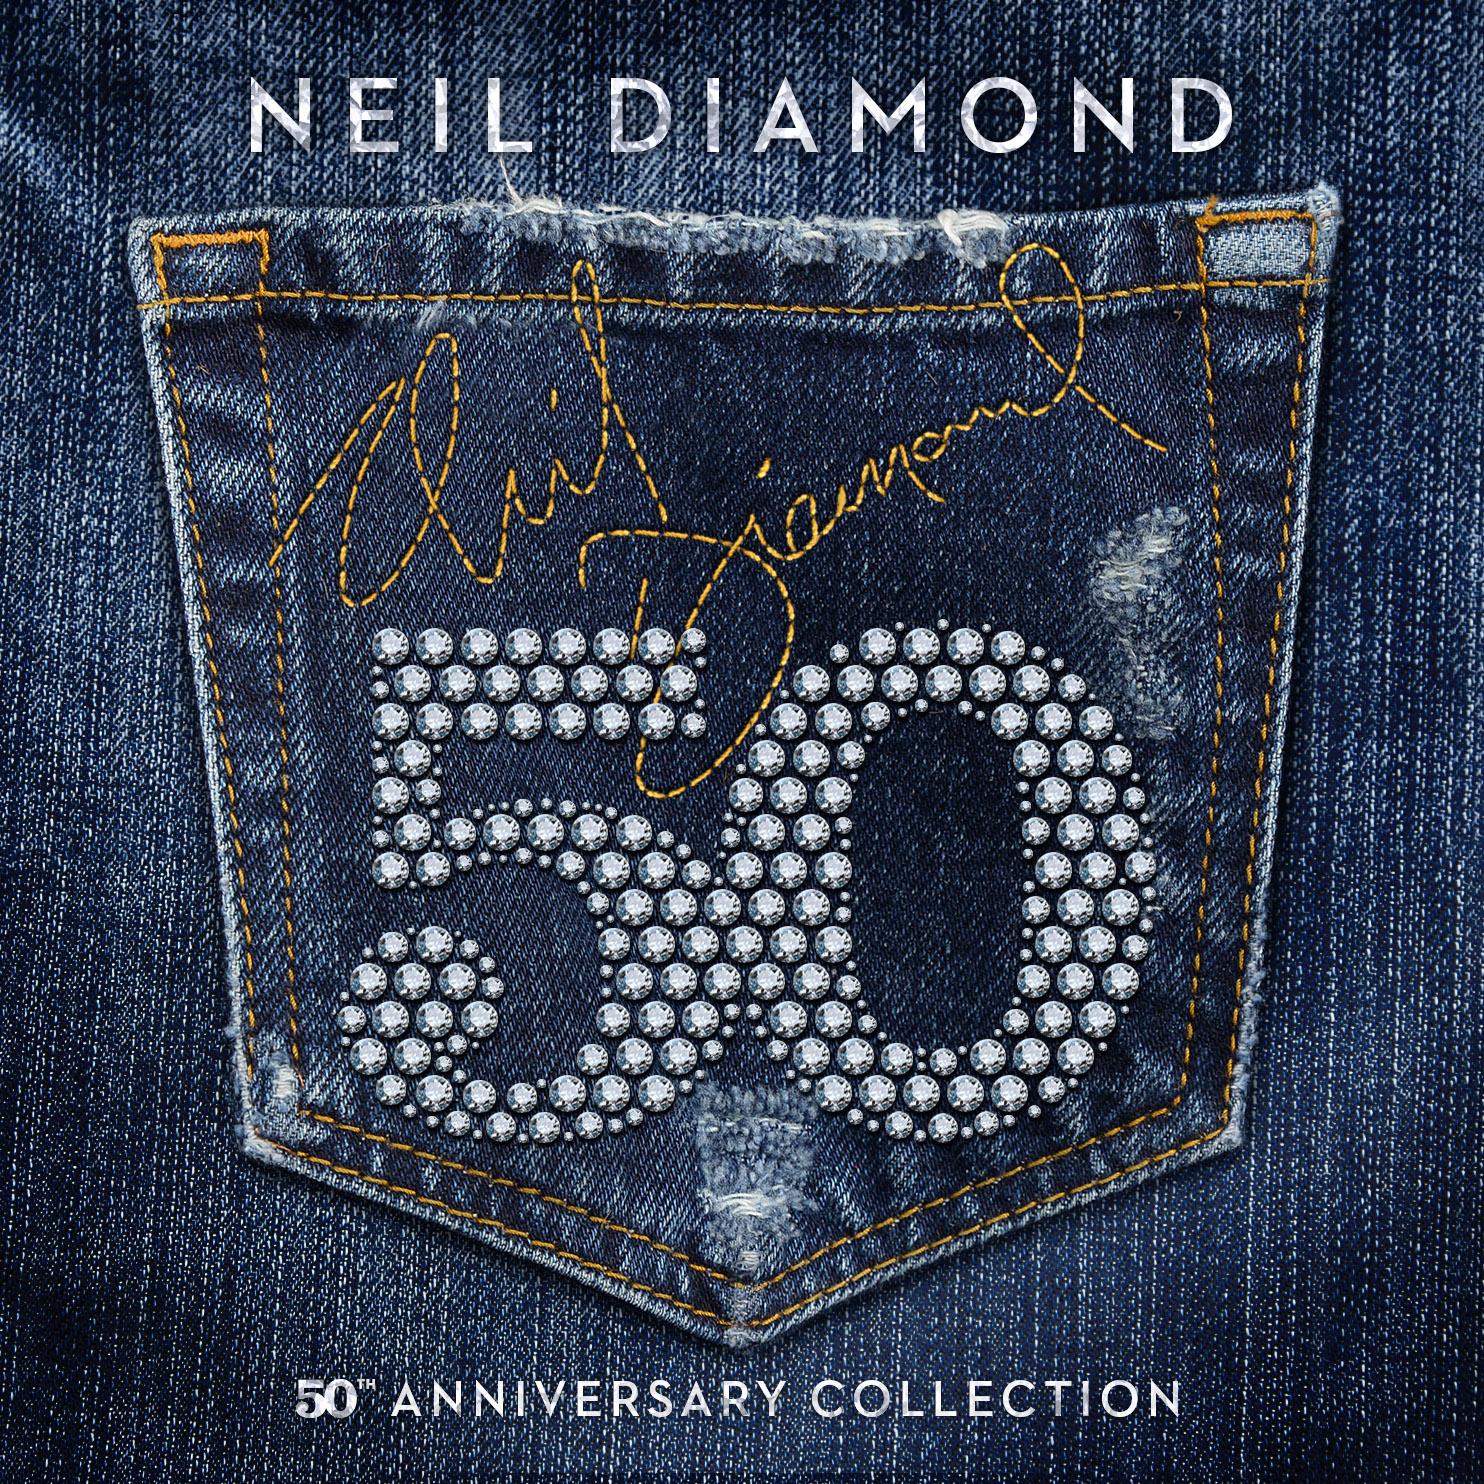 Neil Diamond - 50th Anniversary Collection